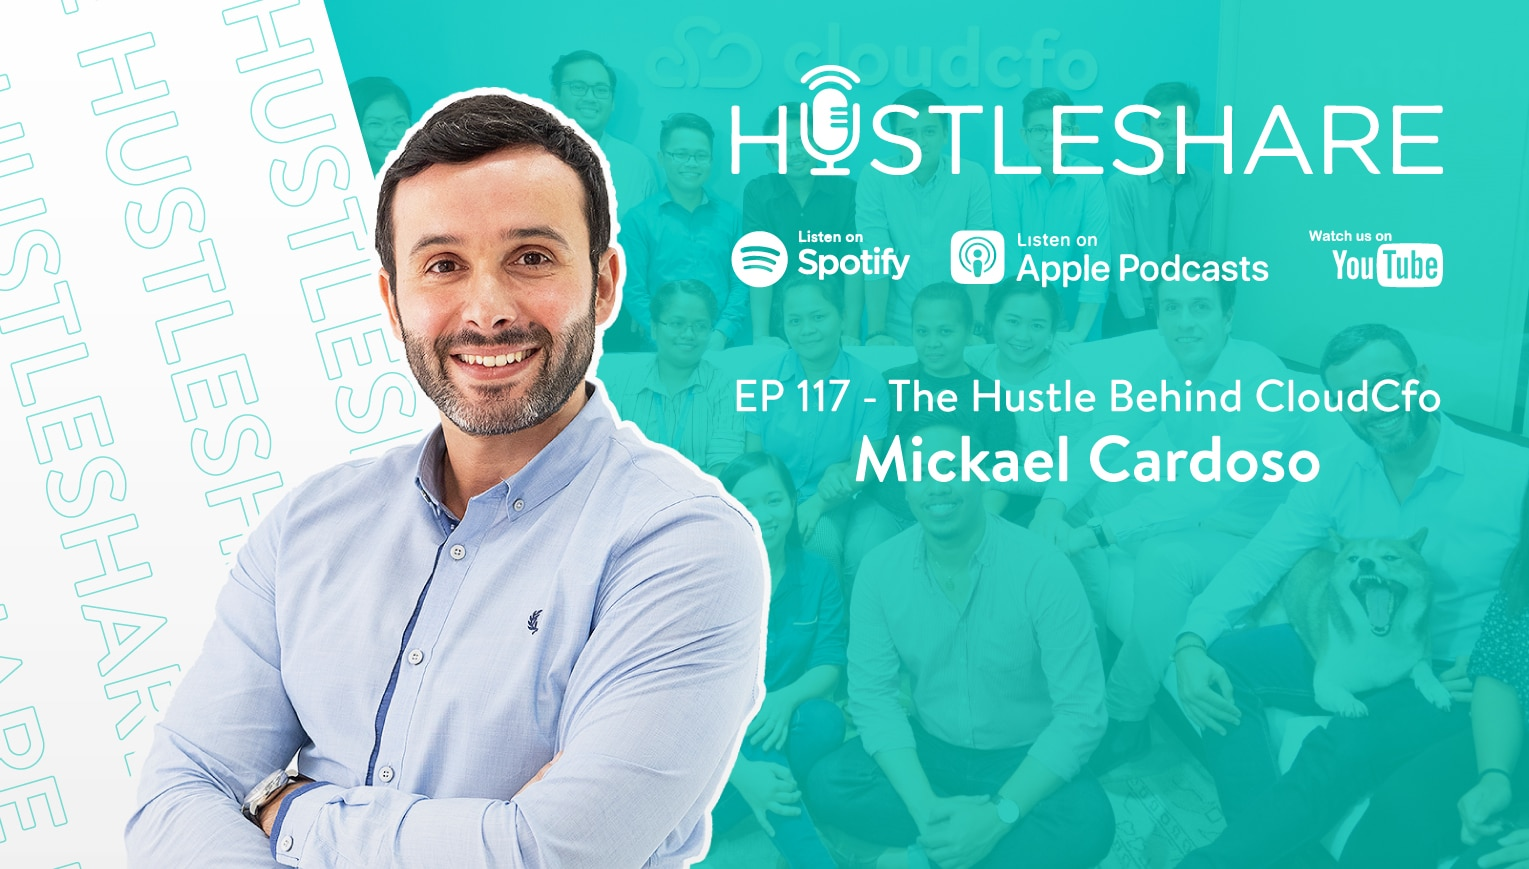 A Podcast: The Hustle Behind CloudCfo